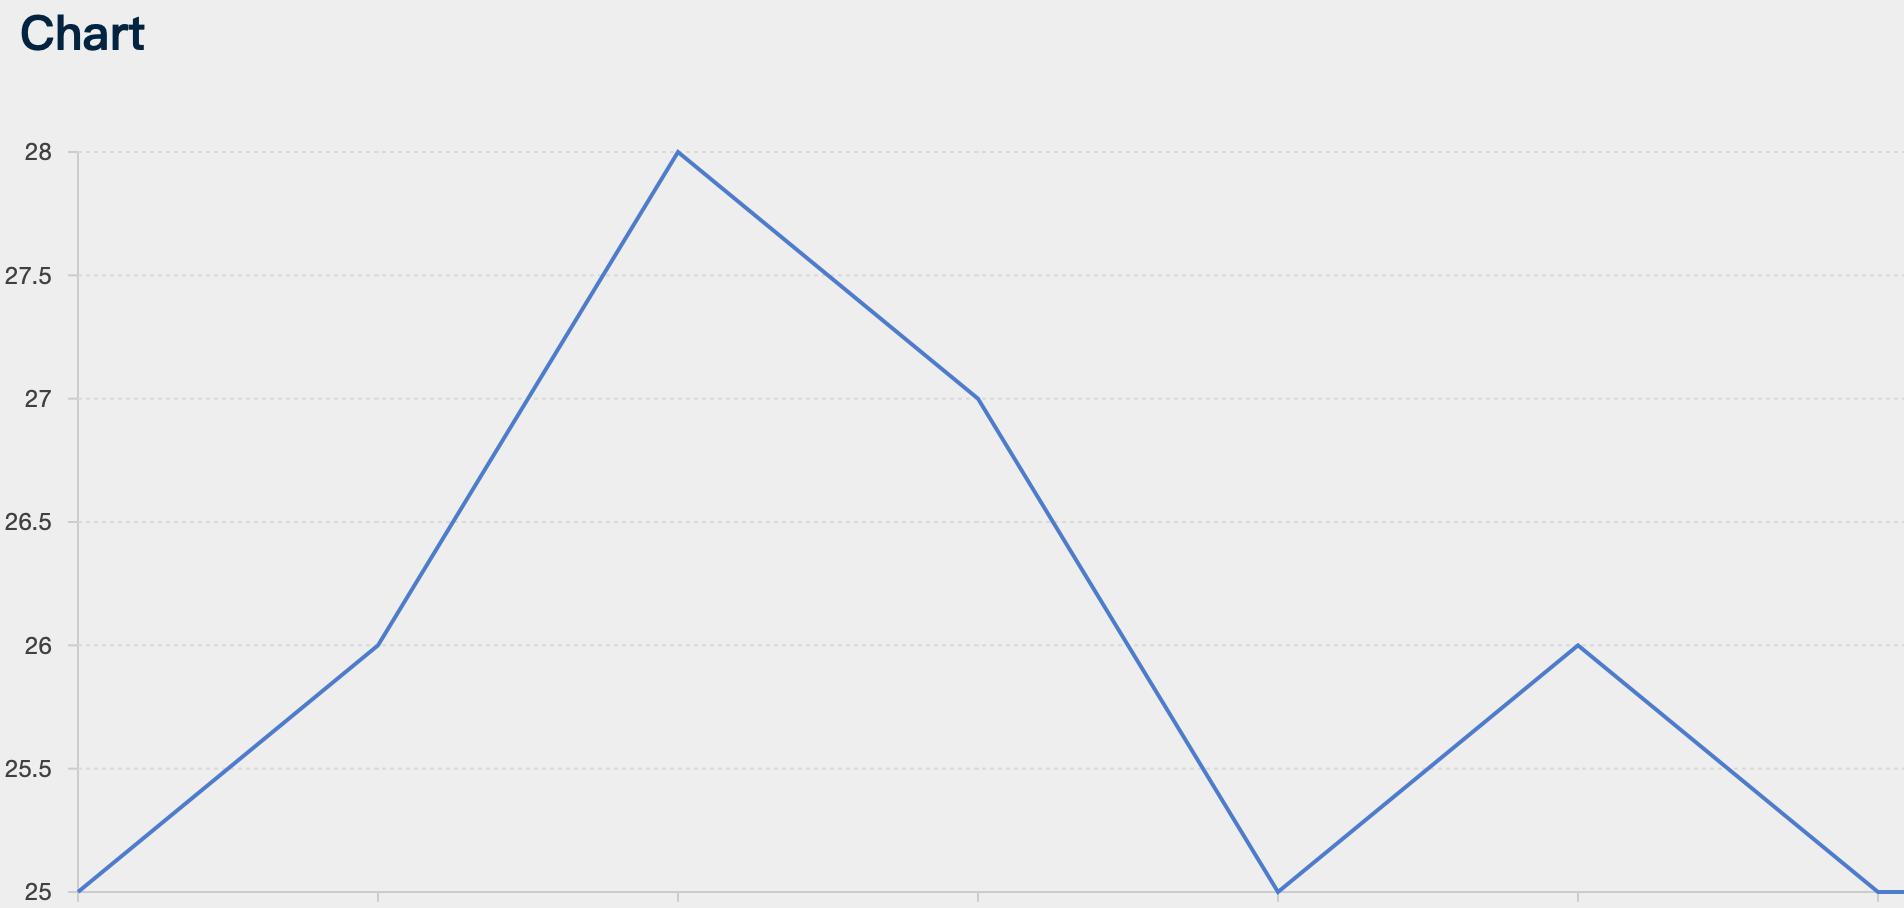 EasyIoT Data Visualization